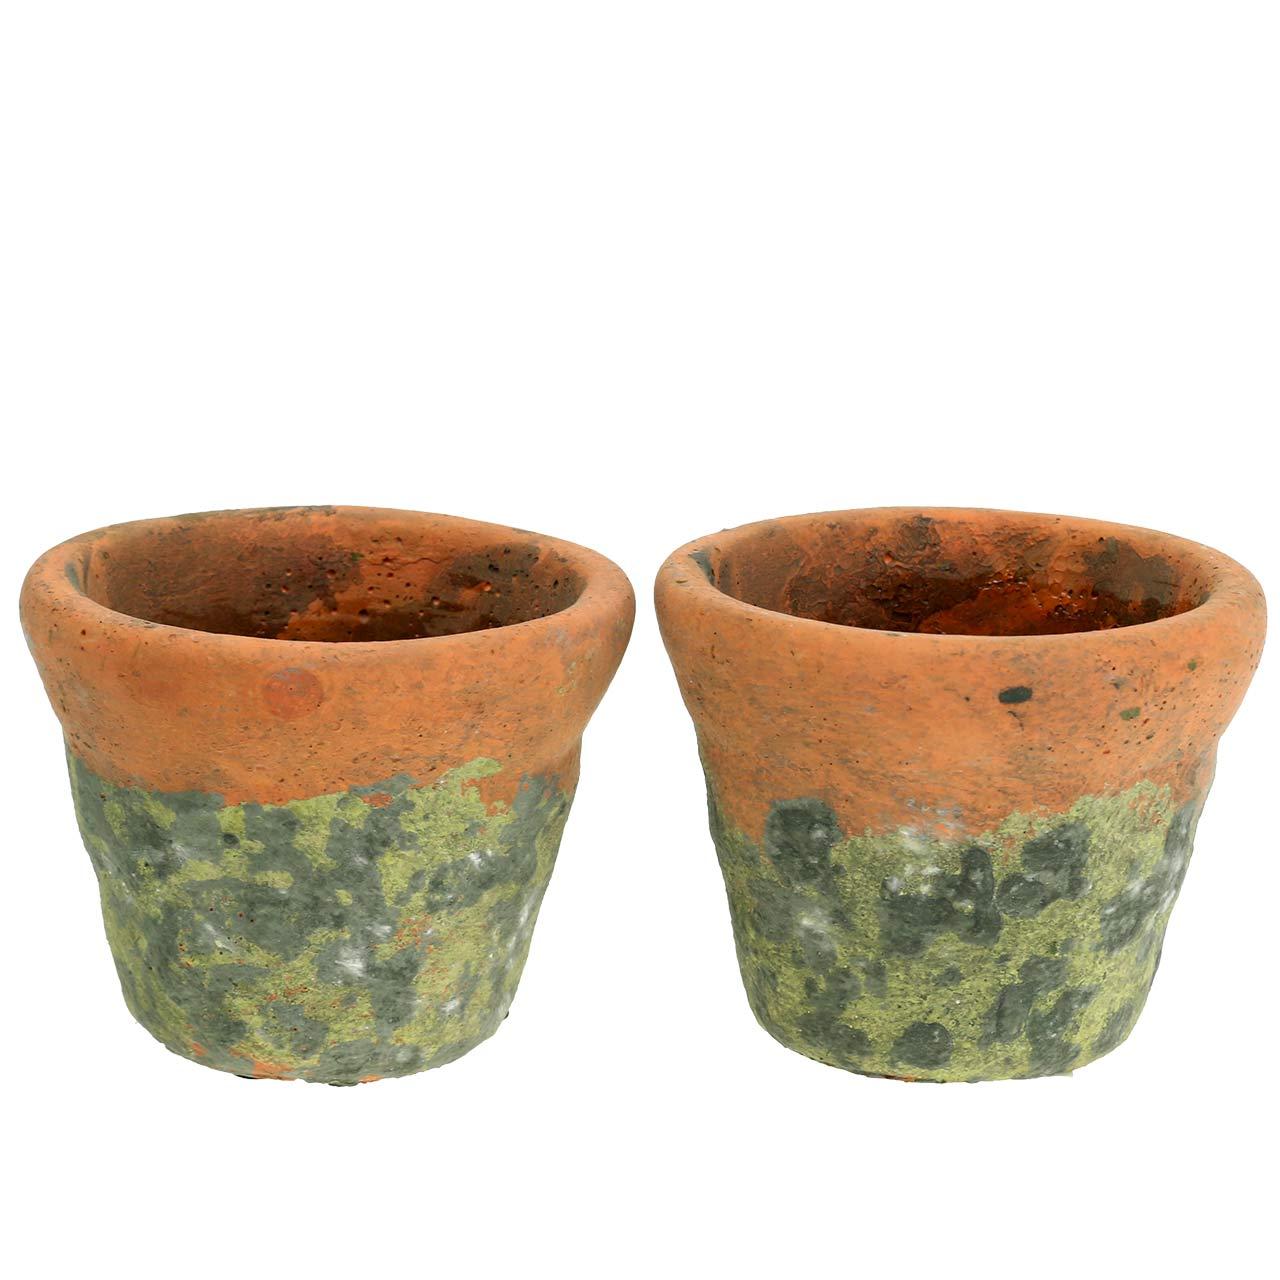 Pflanztopf RANKEN 15 cm Zement Beige Blumentopf Rosen Muster Vintage Design